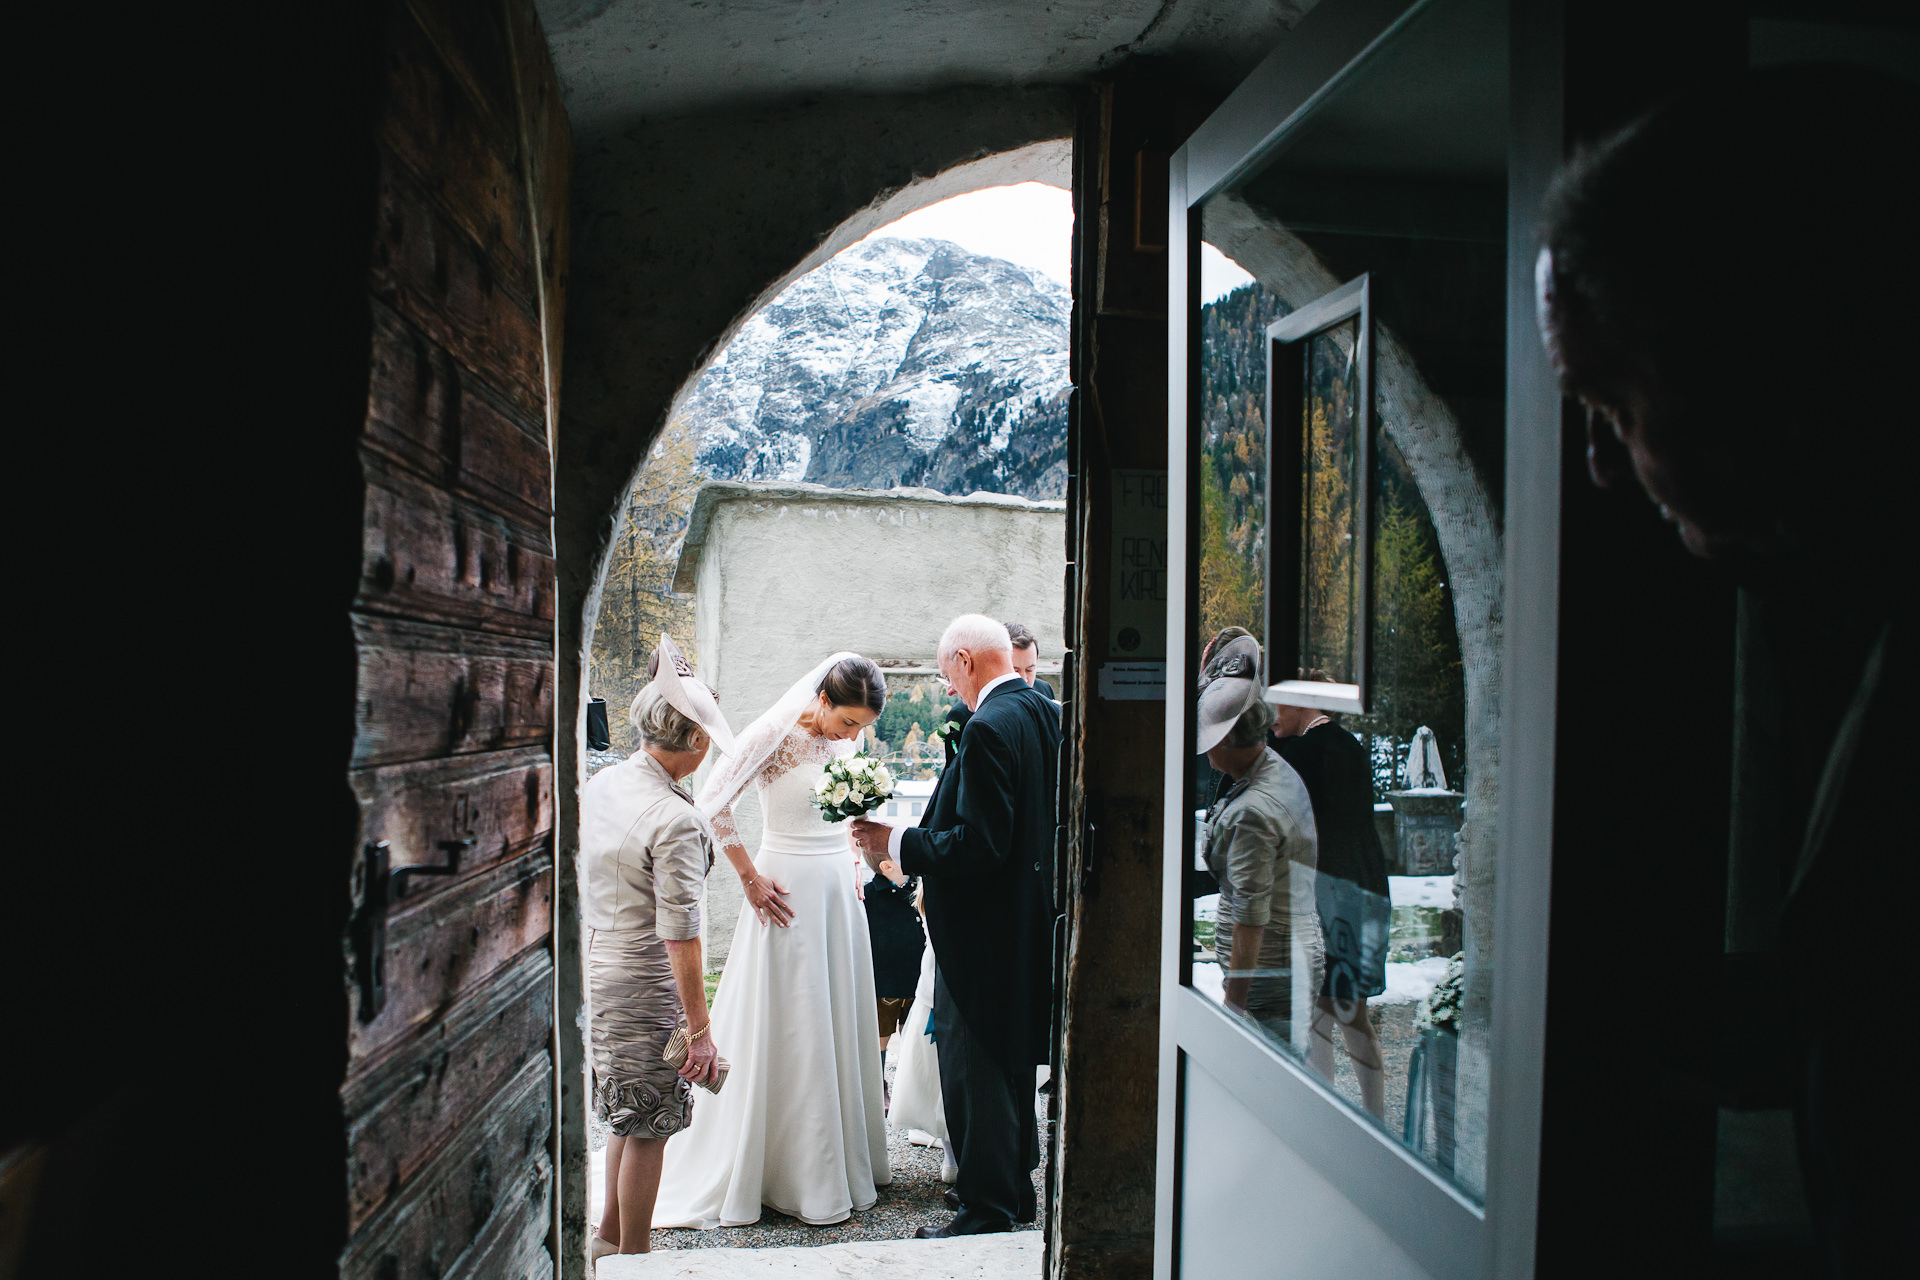 winter, wedding, bride, church, snow